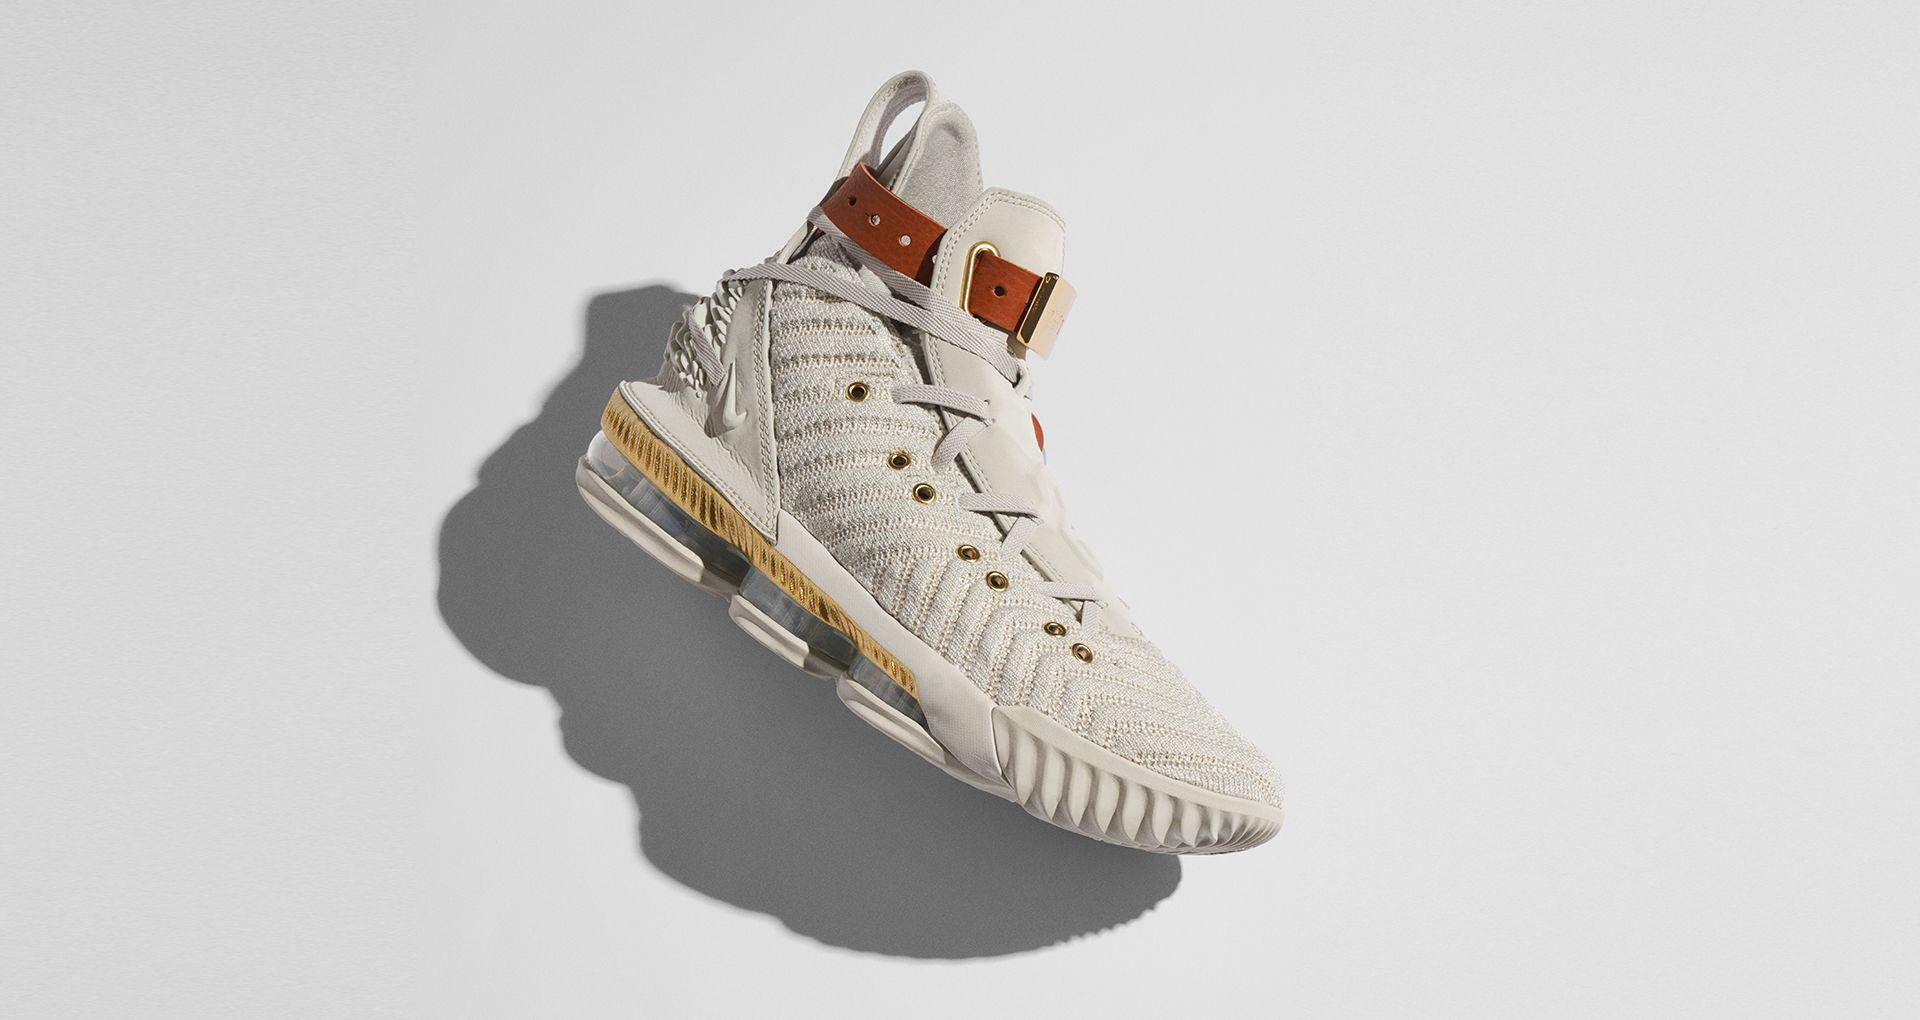 bdade508ef27 Behind The Design  HFR X Lebron 16. Nike+ SNKRS